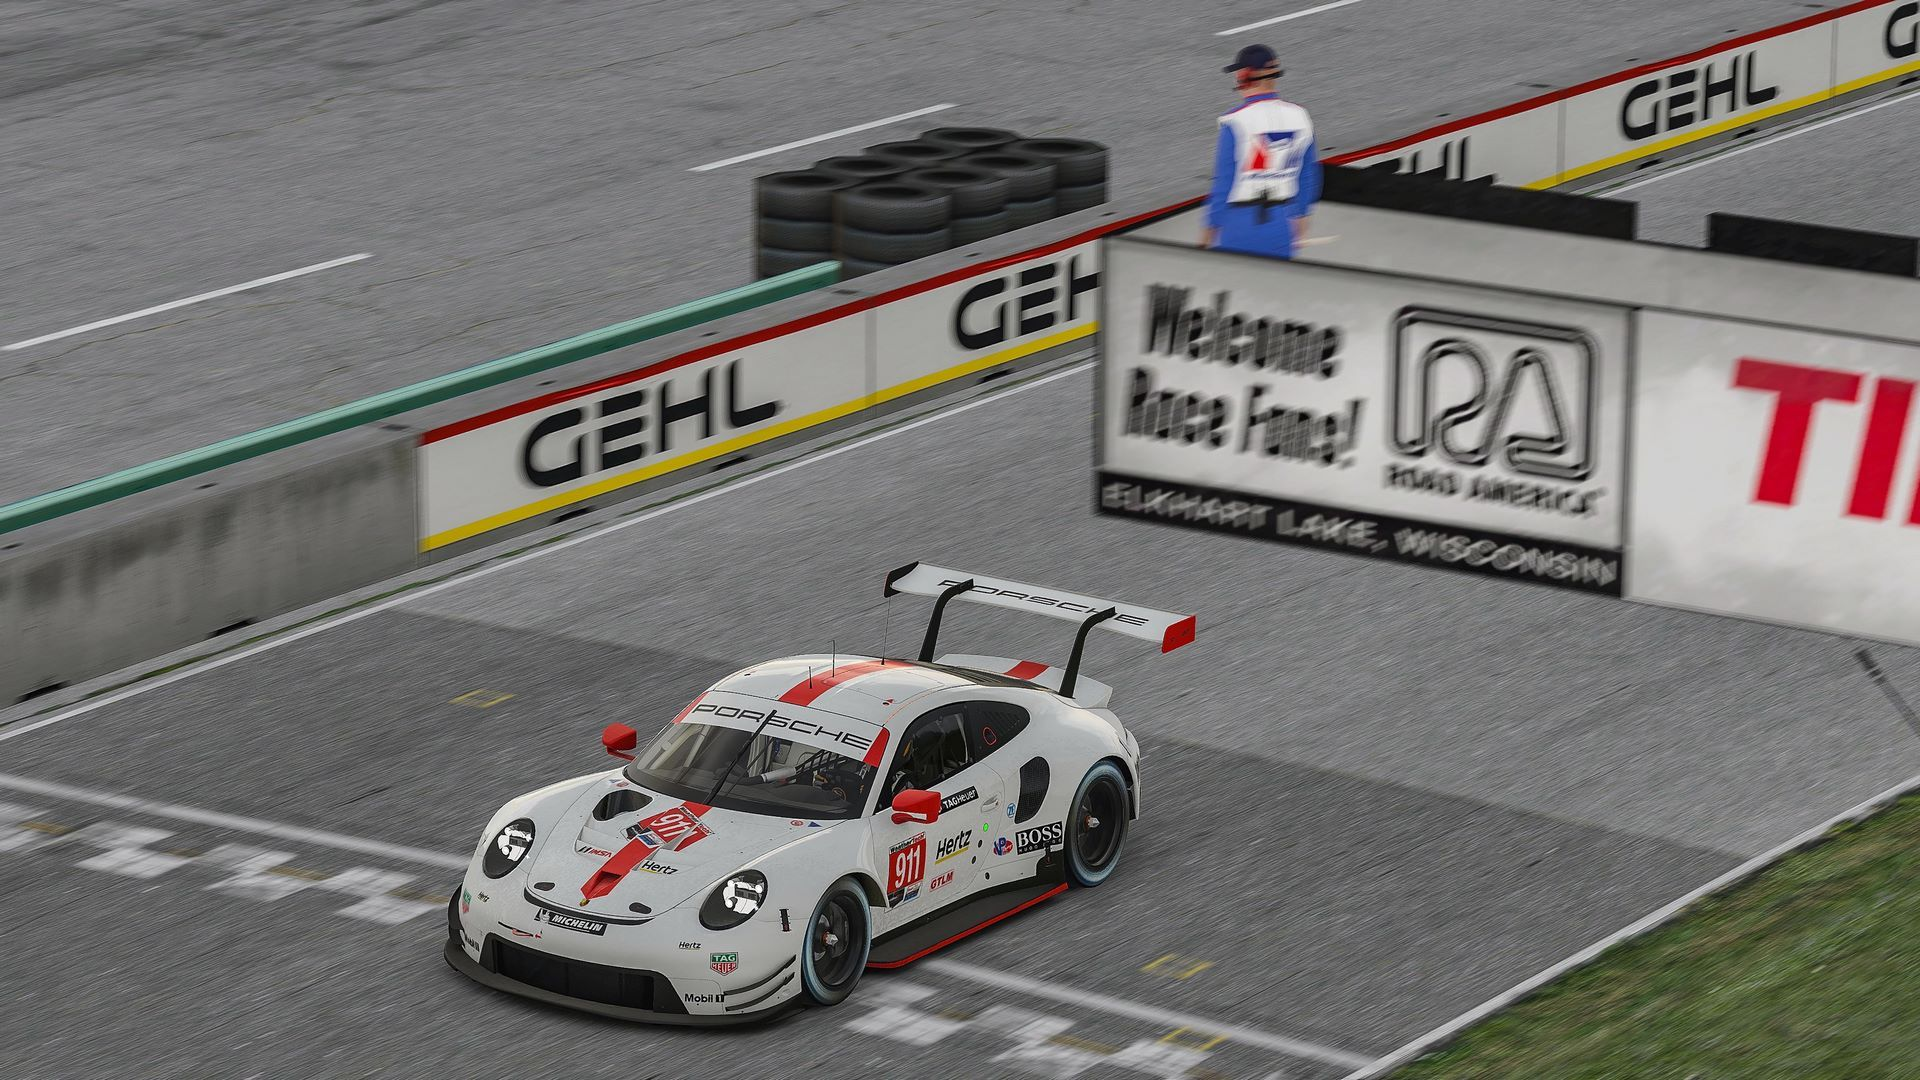 Porsche 911 RSR, Porsche GT Team (#911), Nick Tandy (GB)